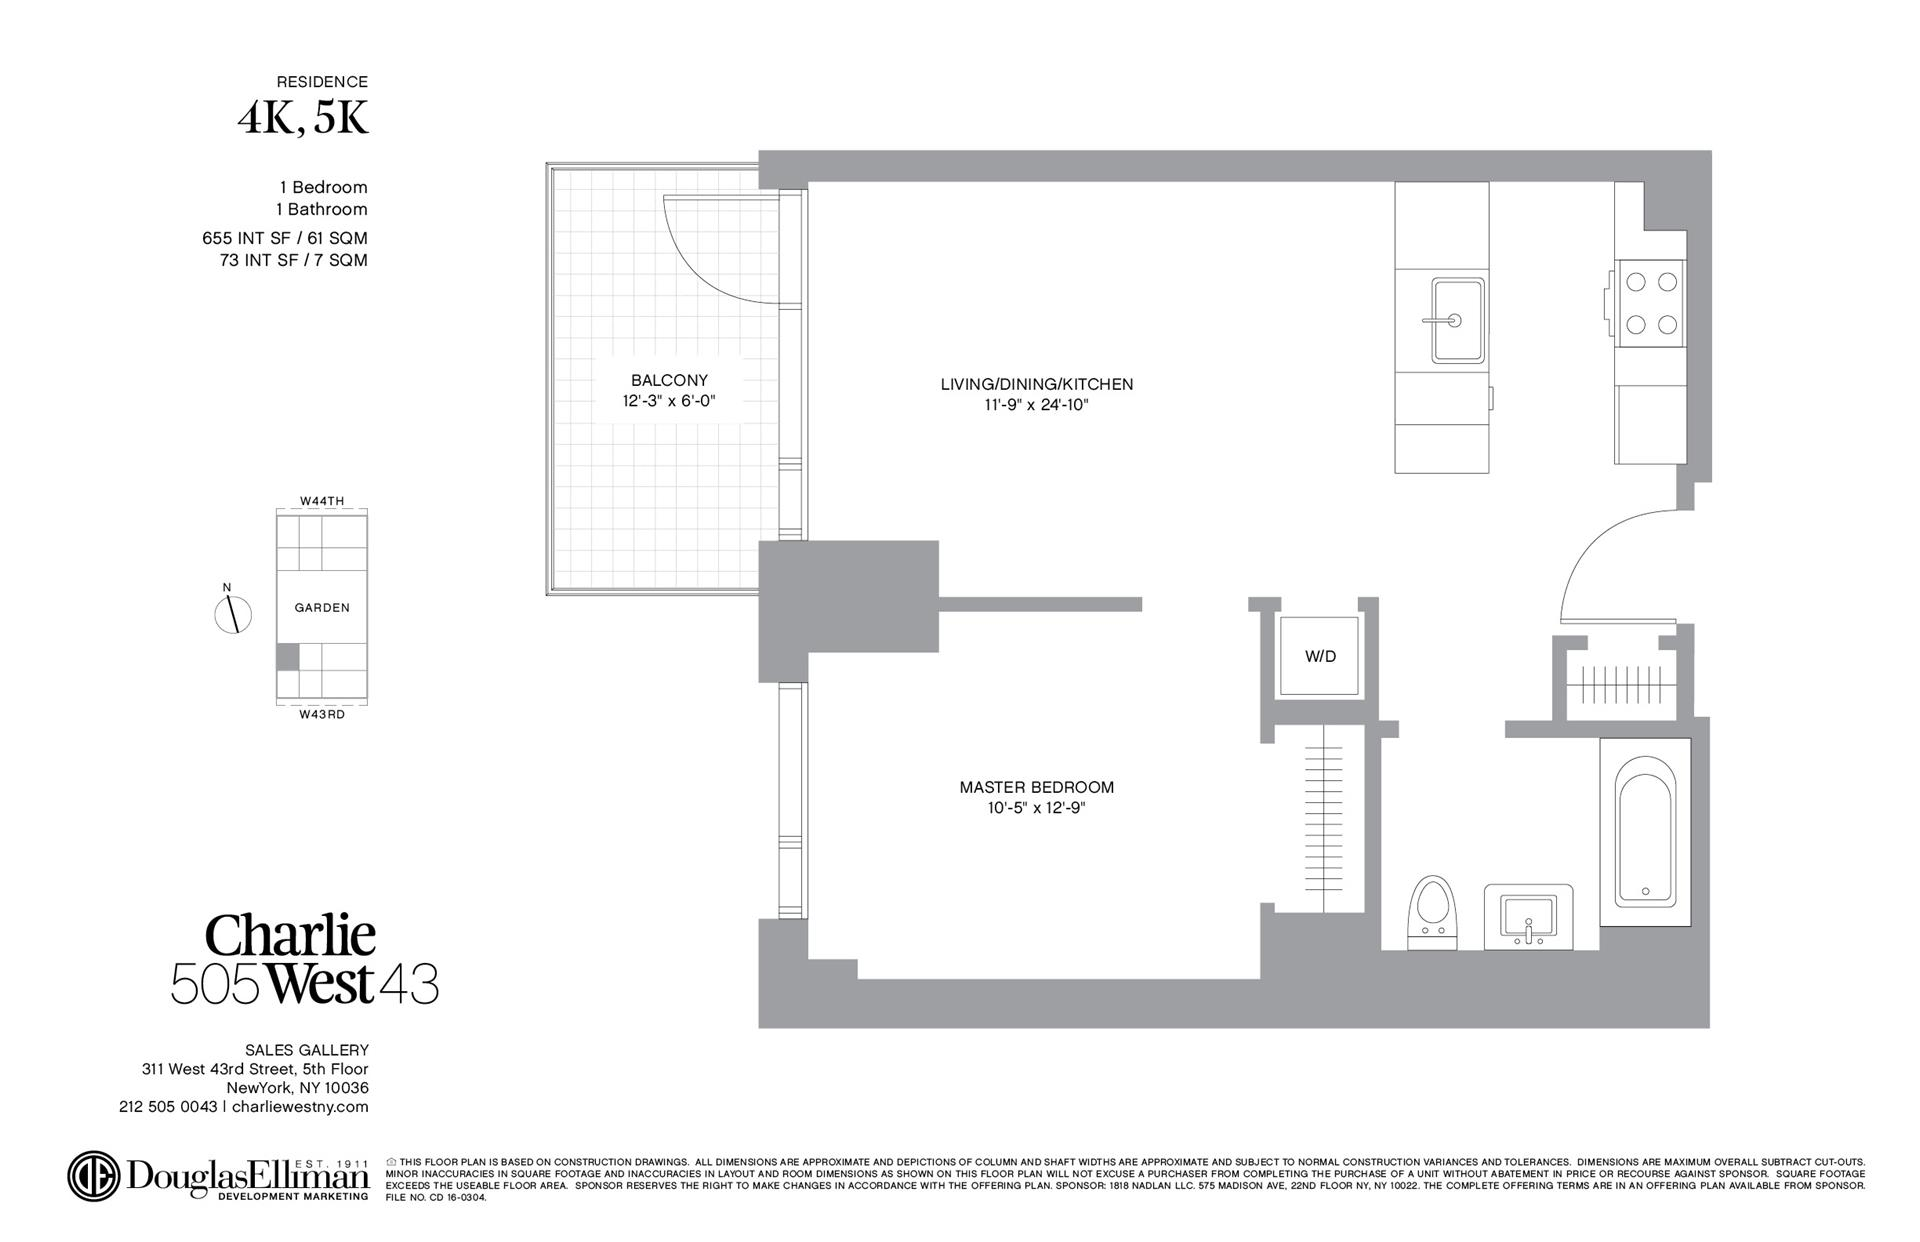 Floor plan of 505 West 43rd St, 4K - Clinton, New York